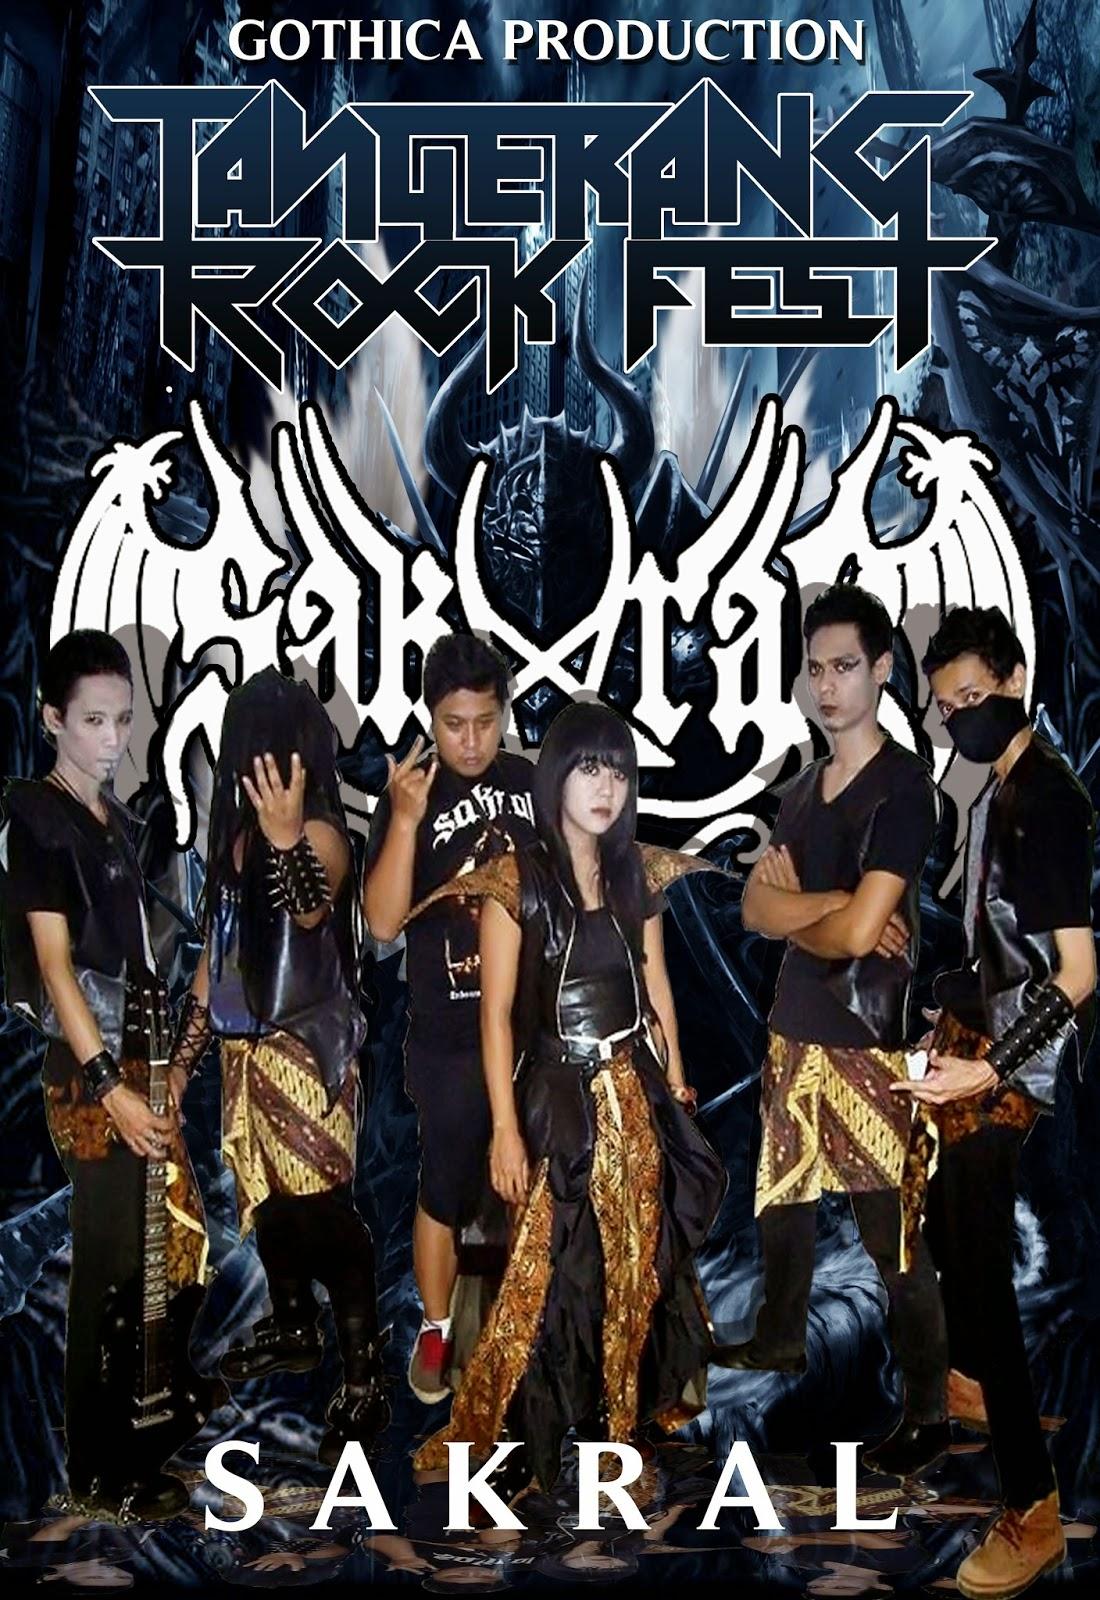 Sakral On Tangerang Rock Fest   Gothica Production